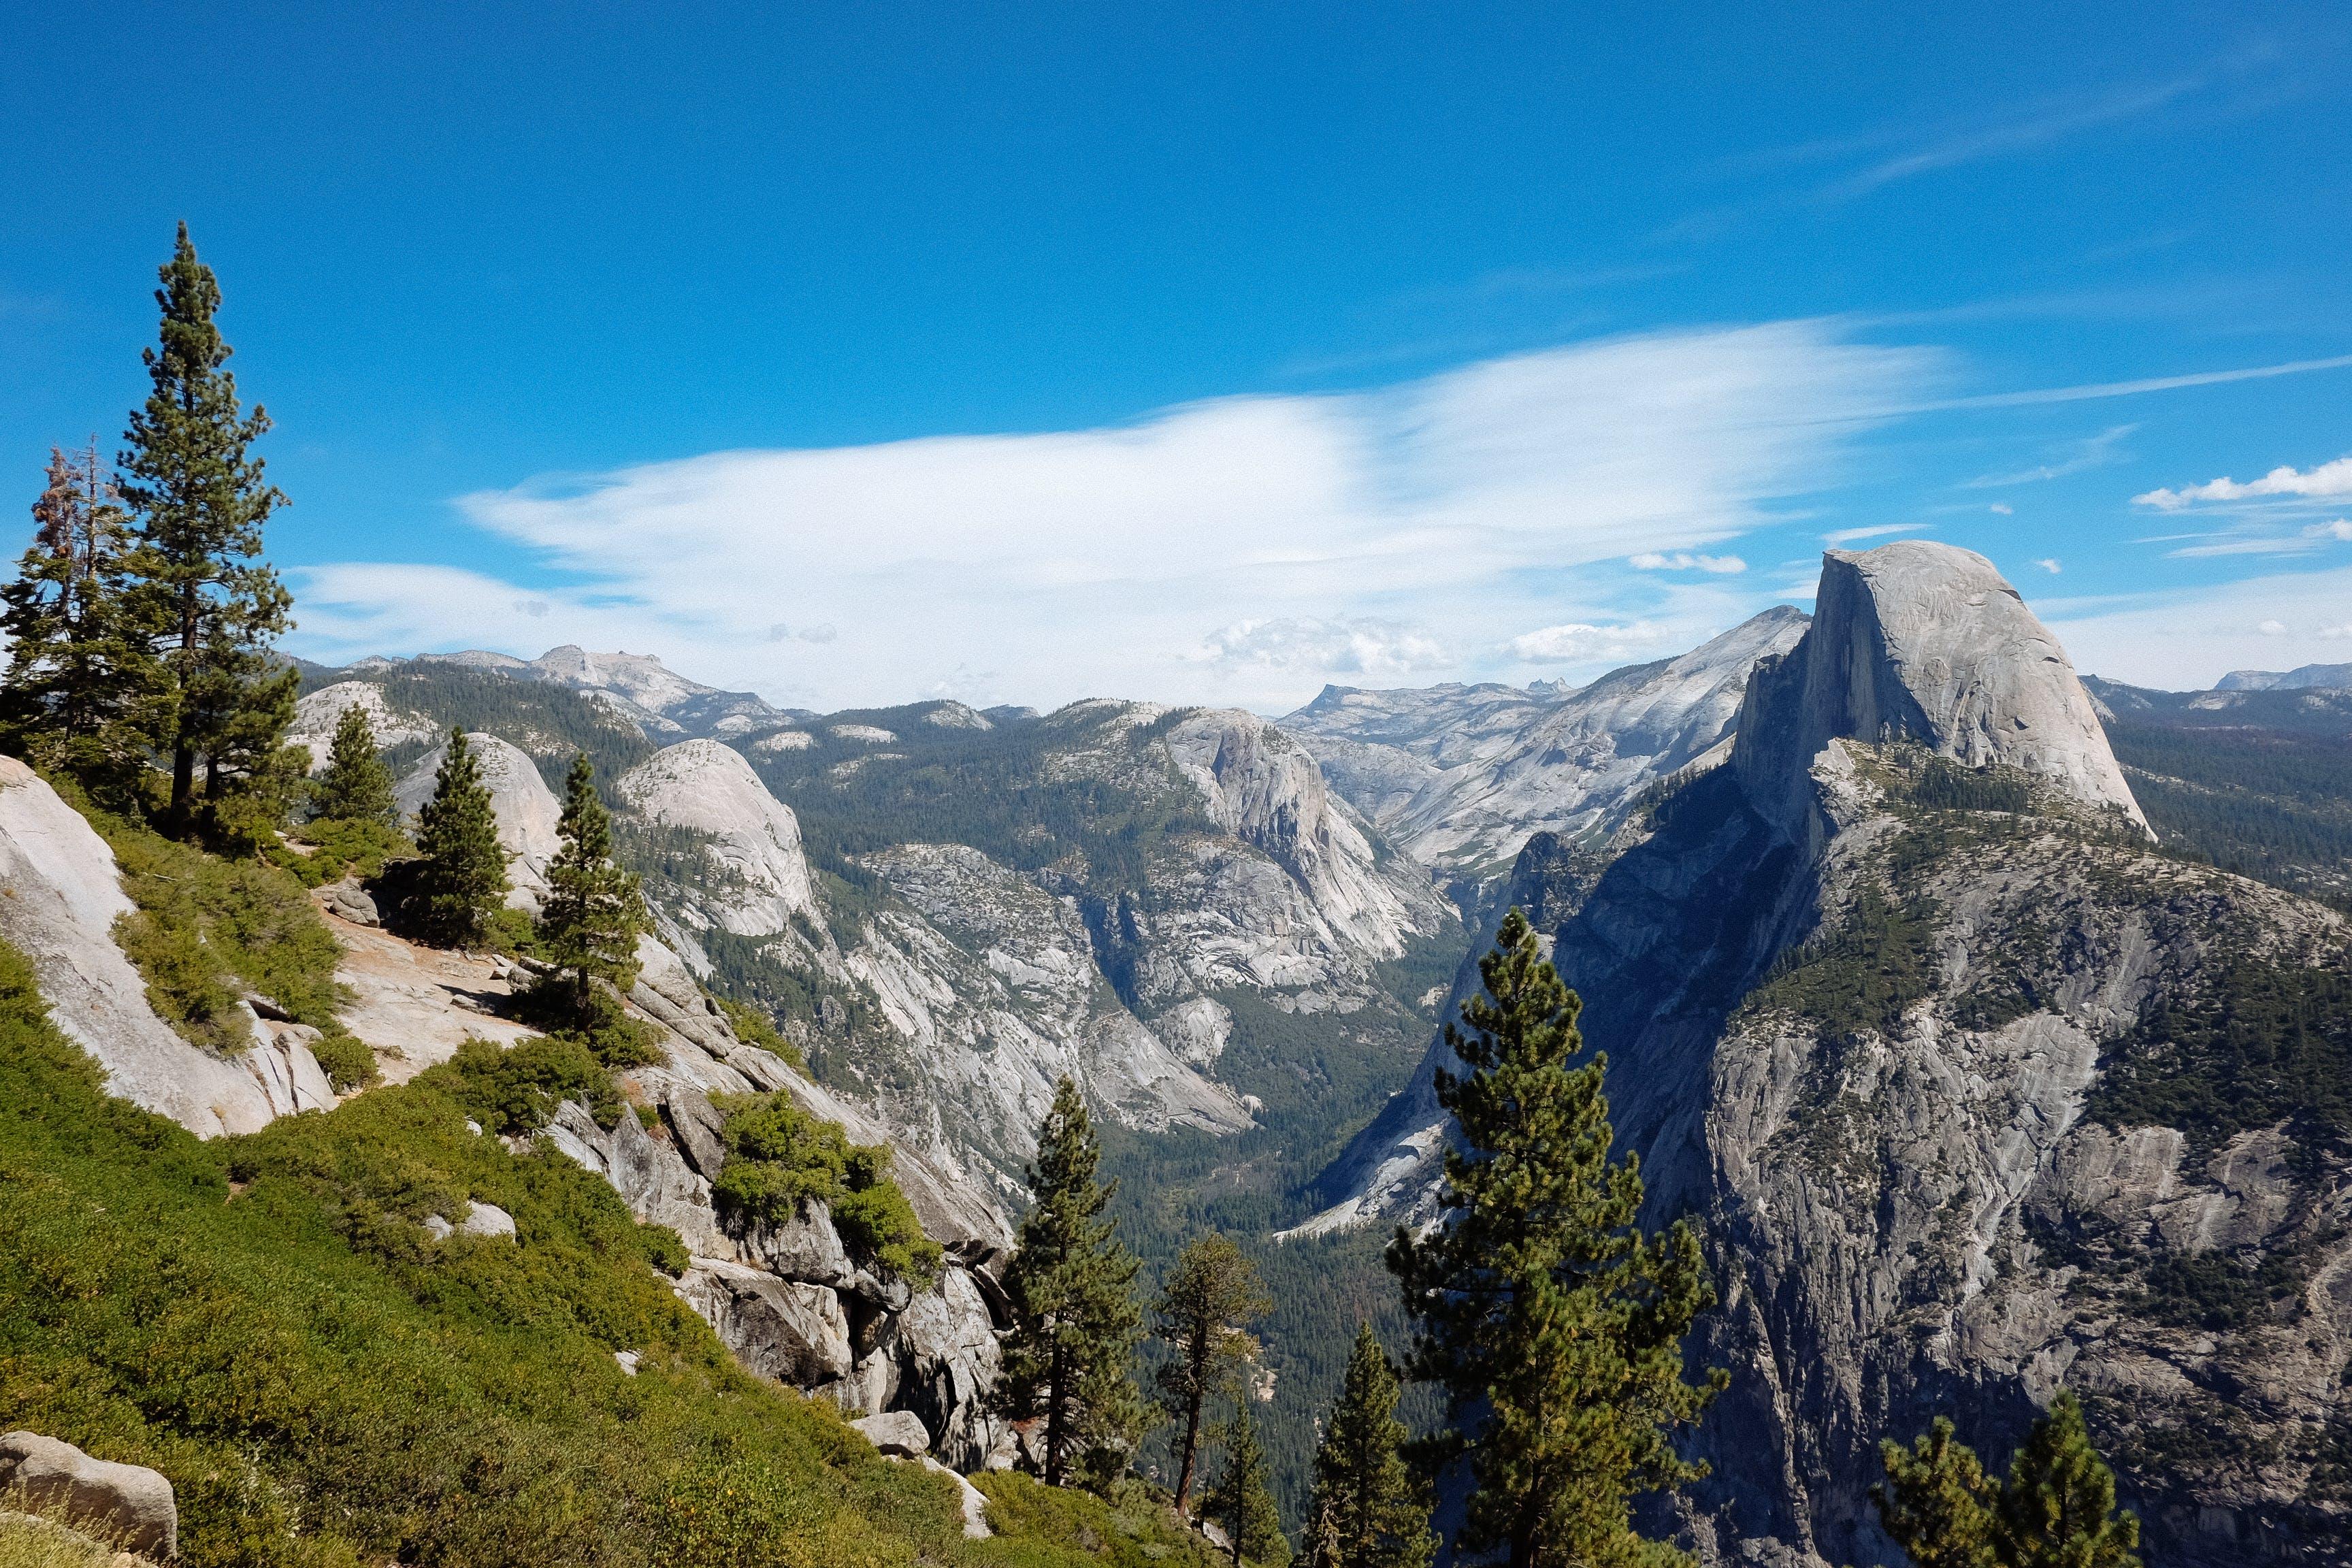 Kostenloses Stock Foto zu berg, felsig, felsiger berg, himmel